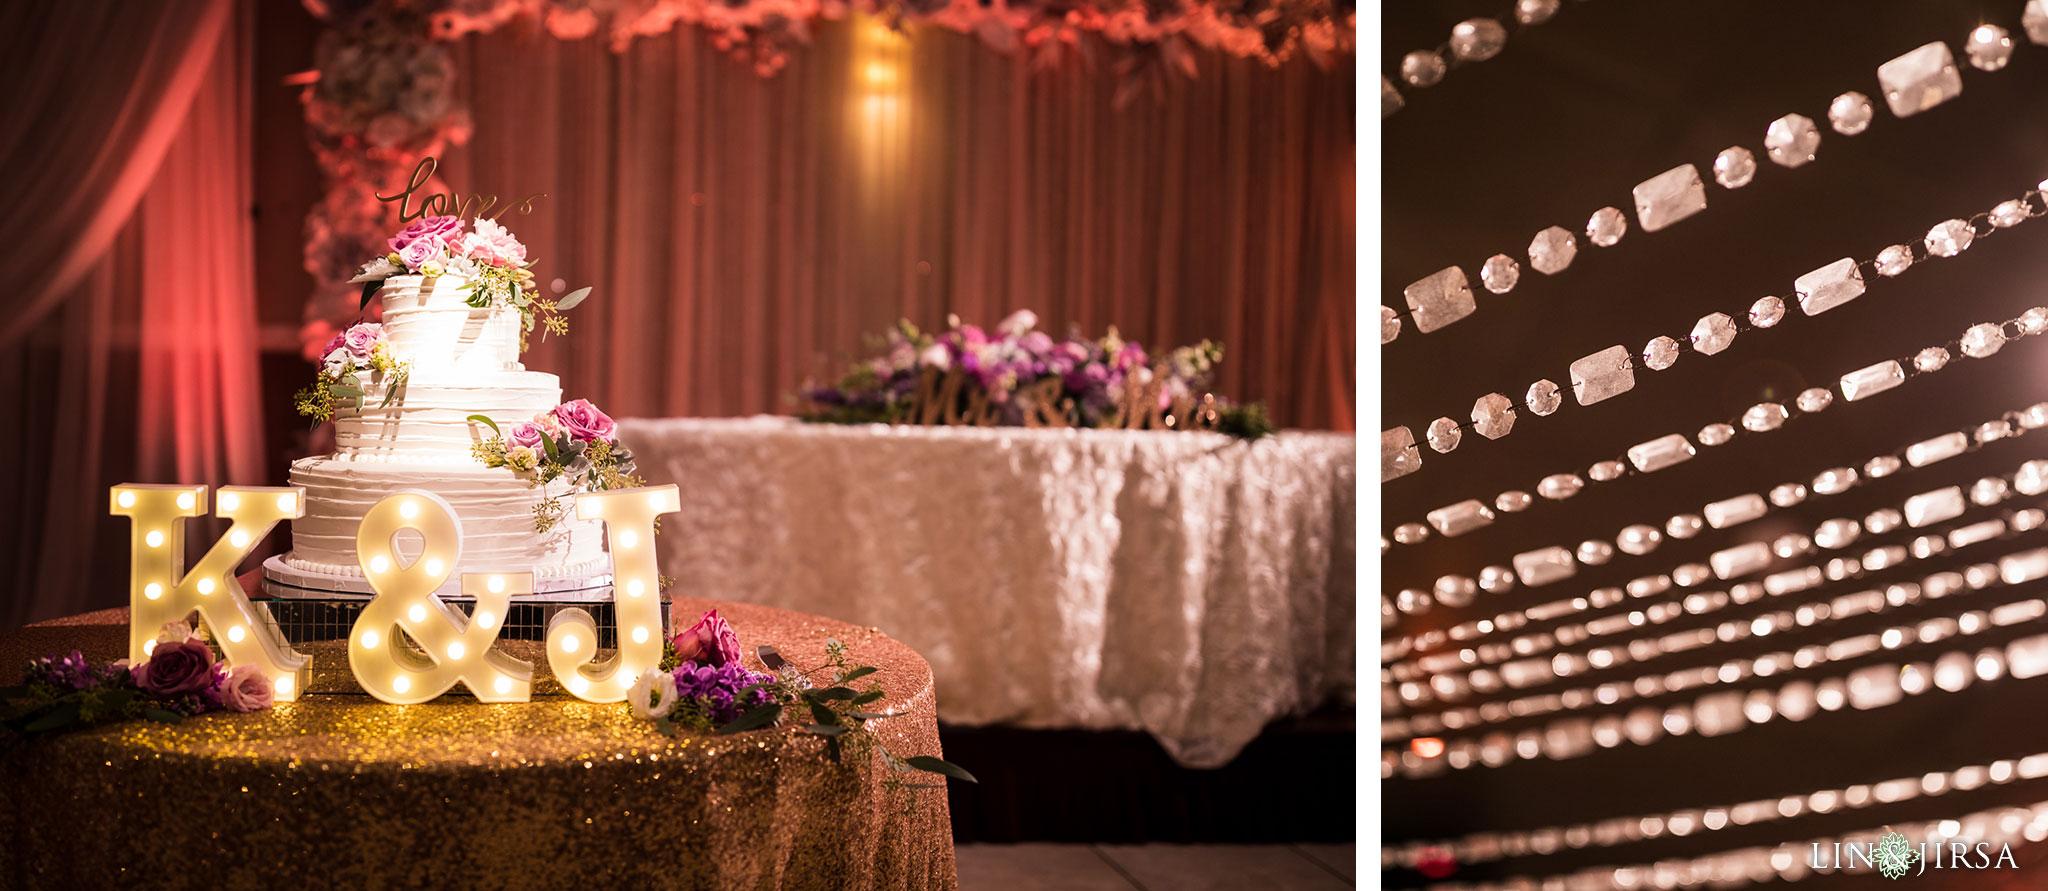 19 mon amour banquet wedding reception photography